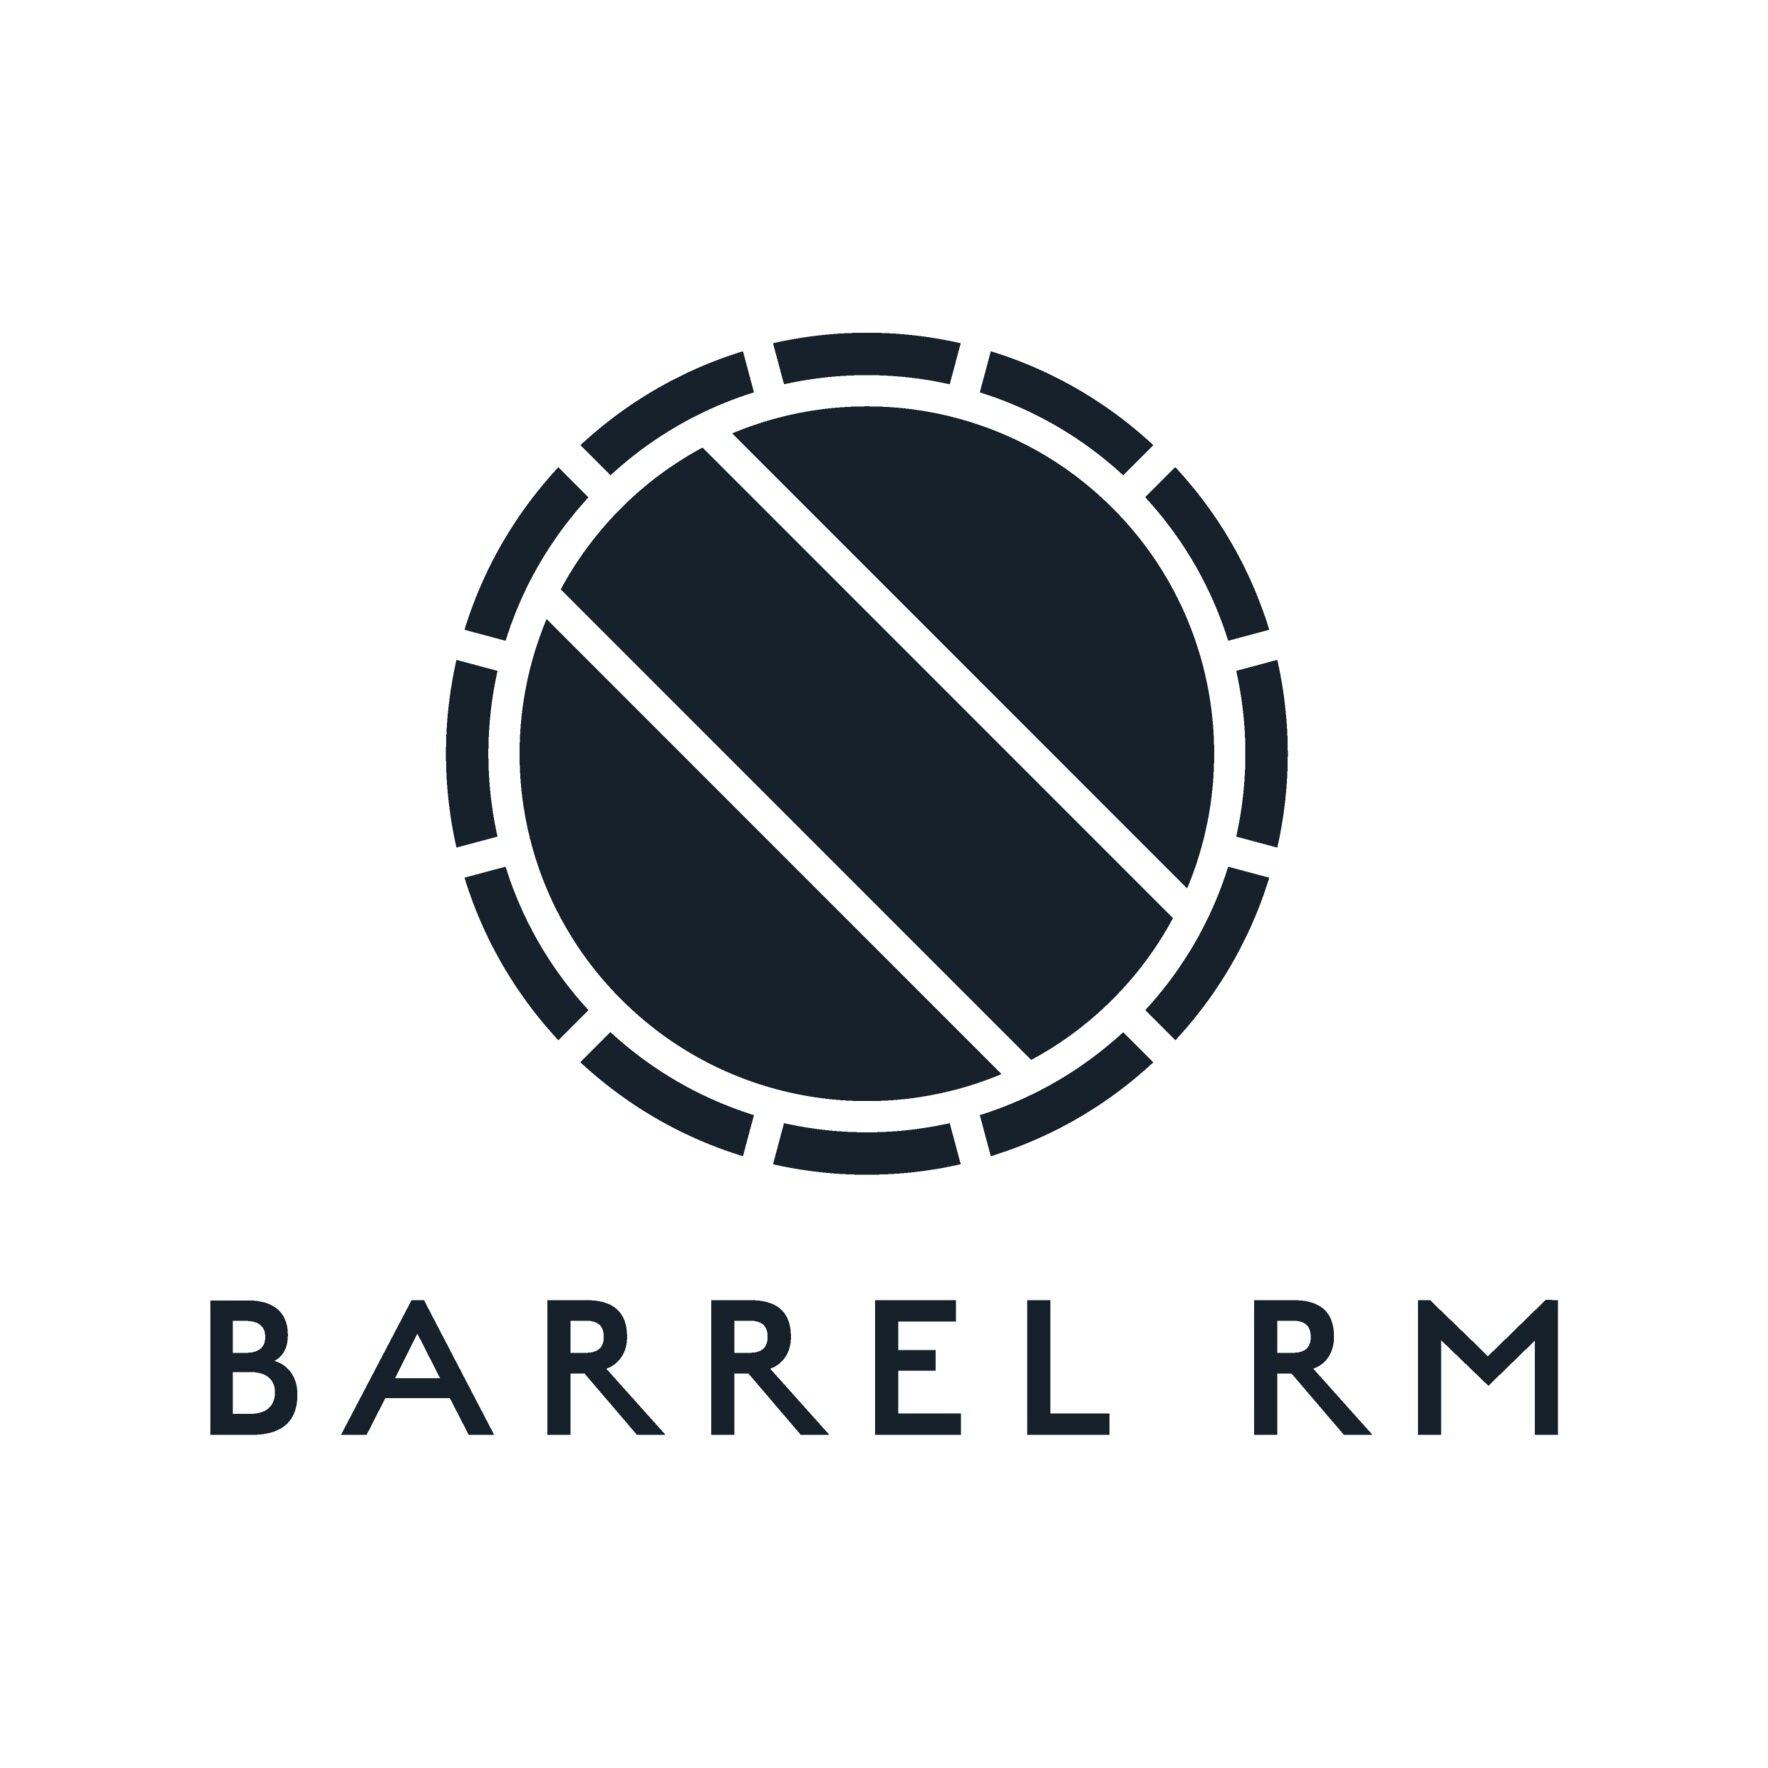 barrel rm samuel backes barrel rm samuel backes